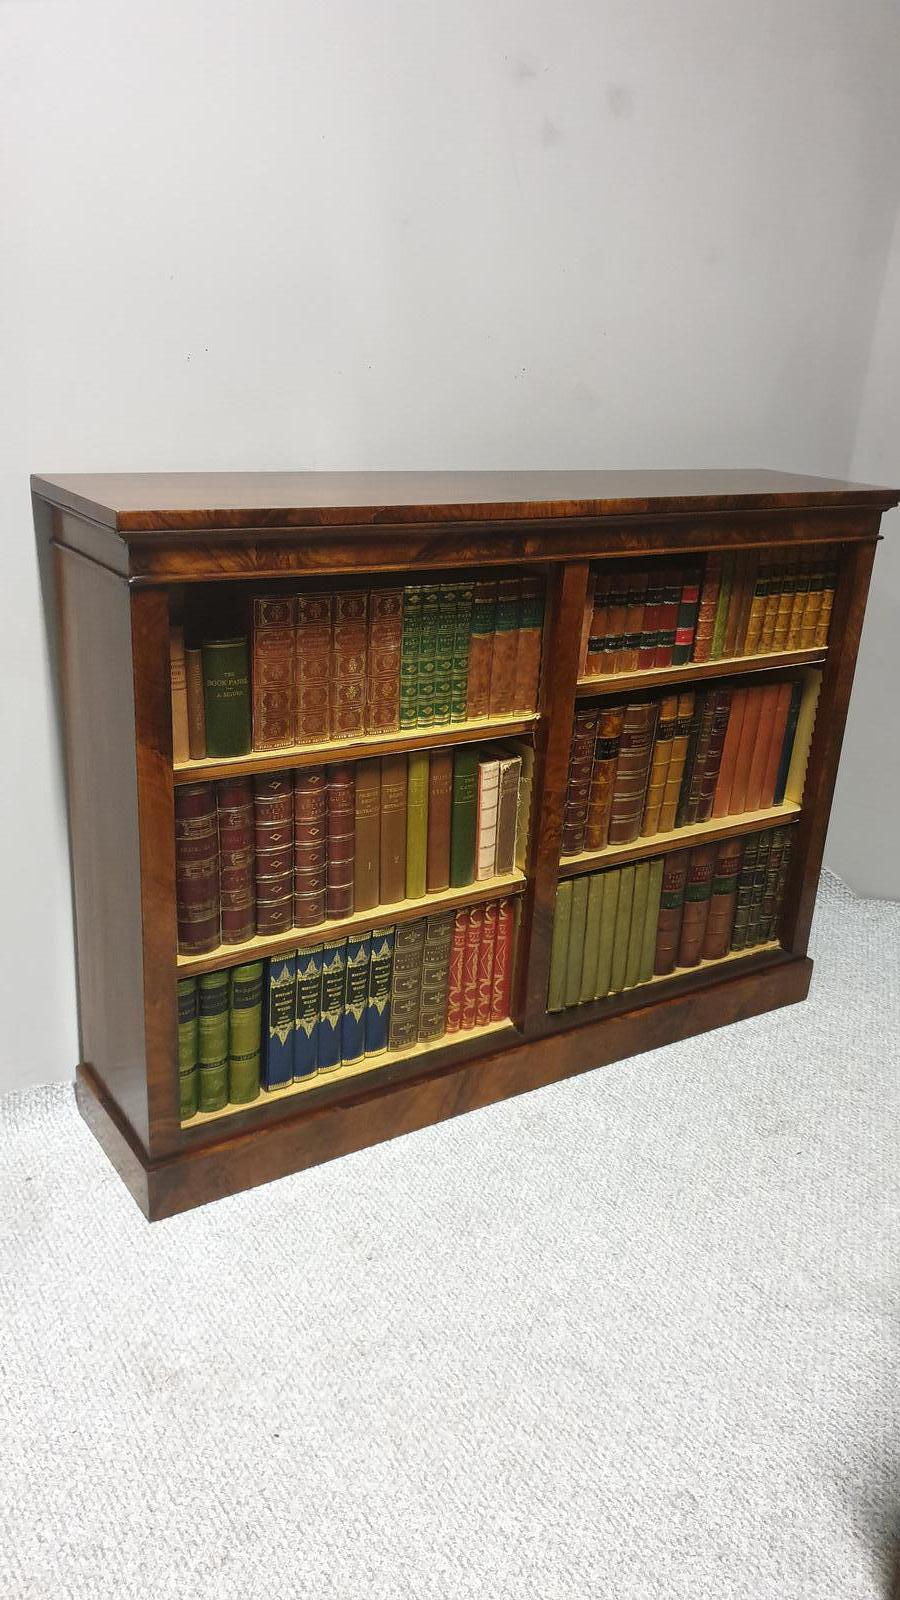 Victorian Burr Walnut Adjustable Open Bookcase (1 of 1)